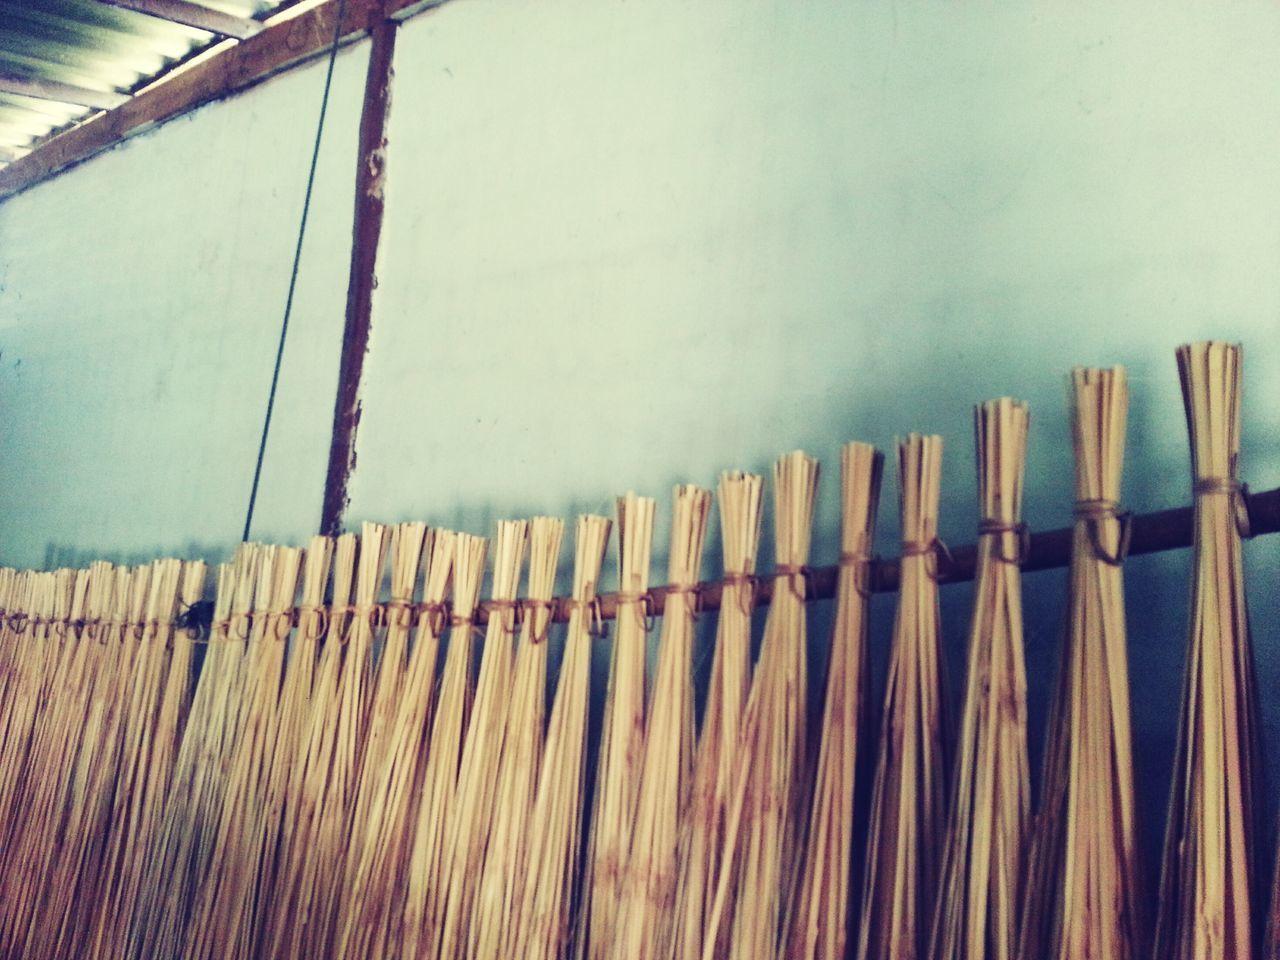 Wood - Material Bamboo Bamboodesign Nature Tree Bamboos WoodArt No People Bamboo - Material